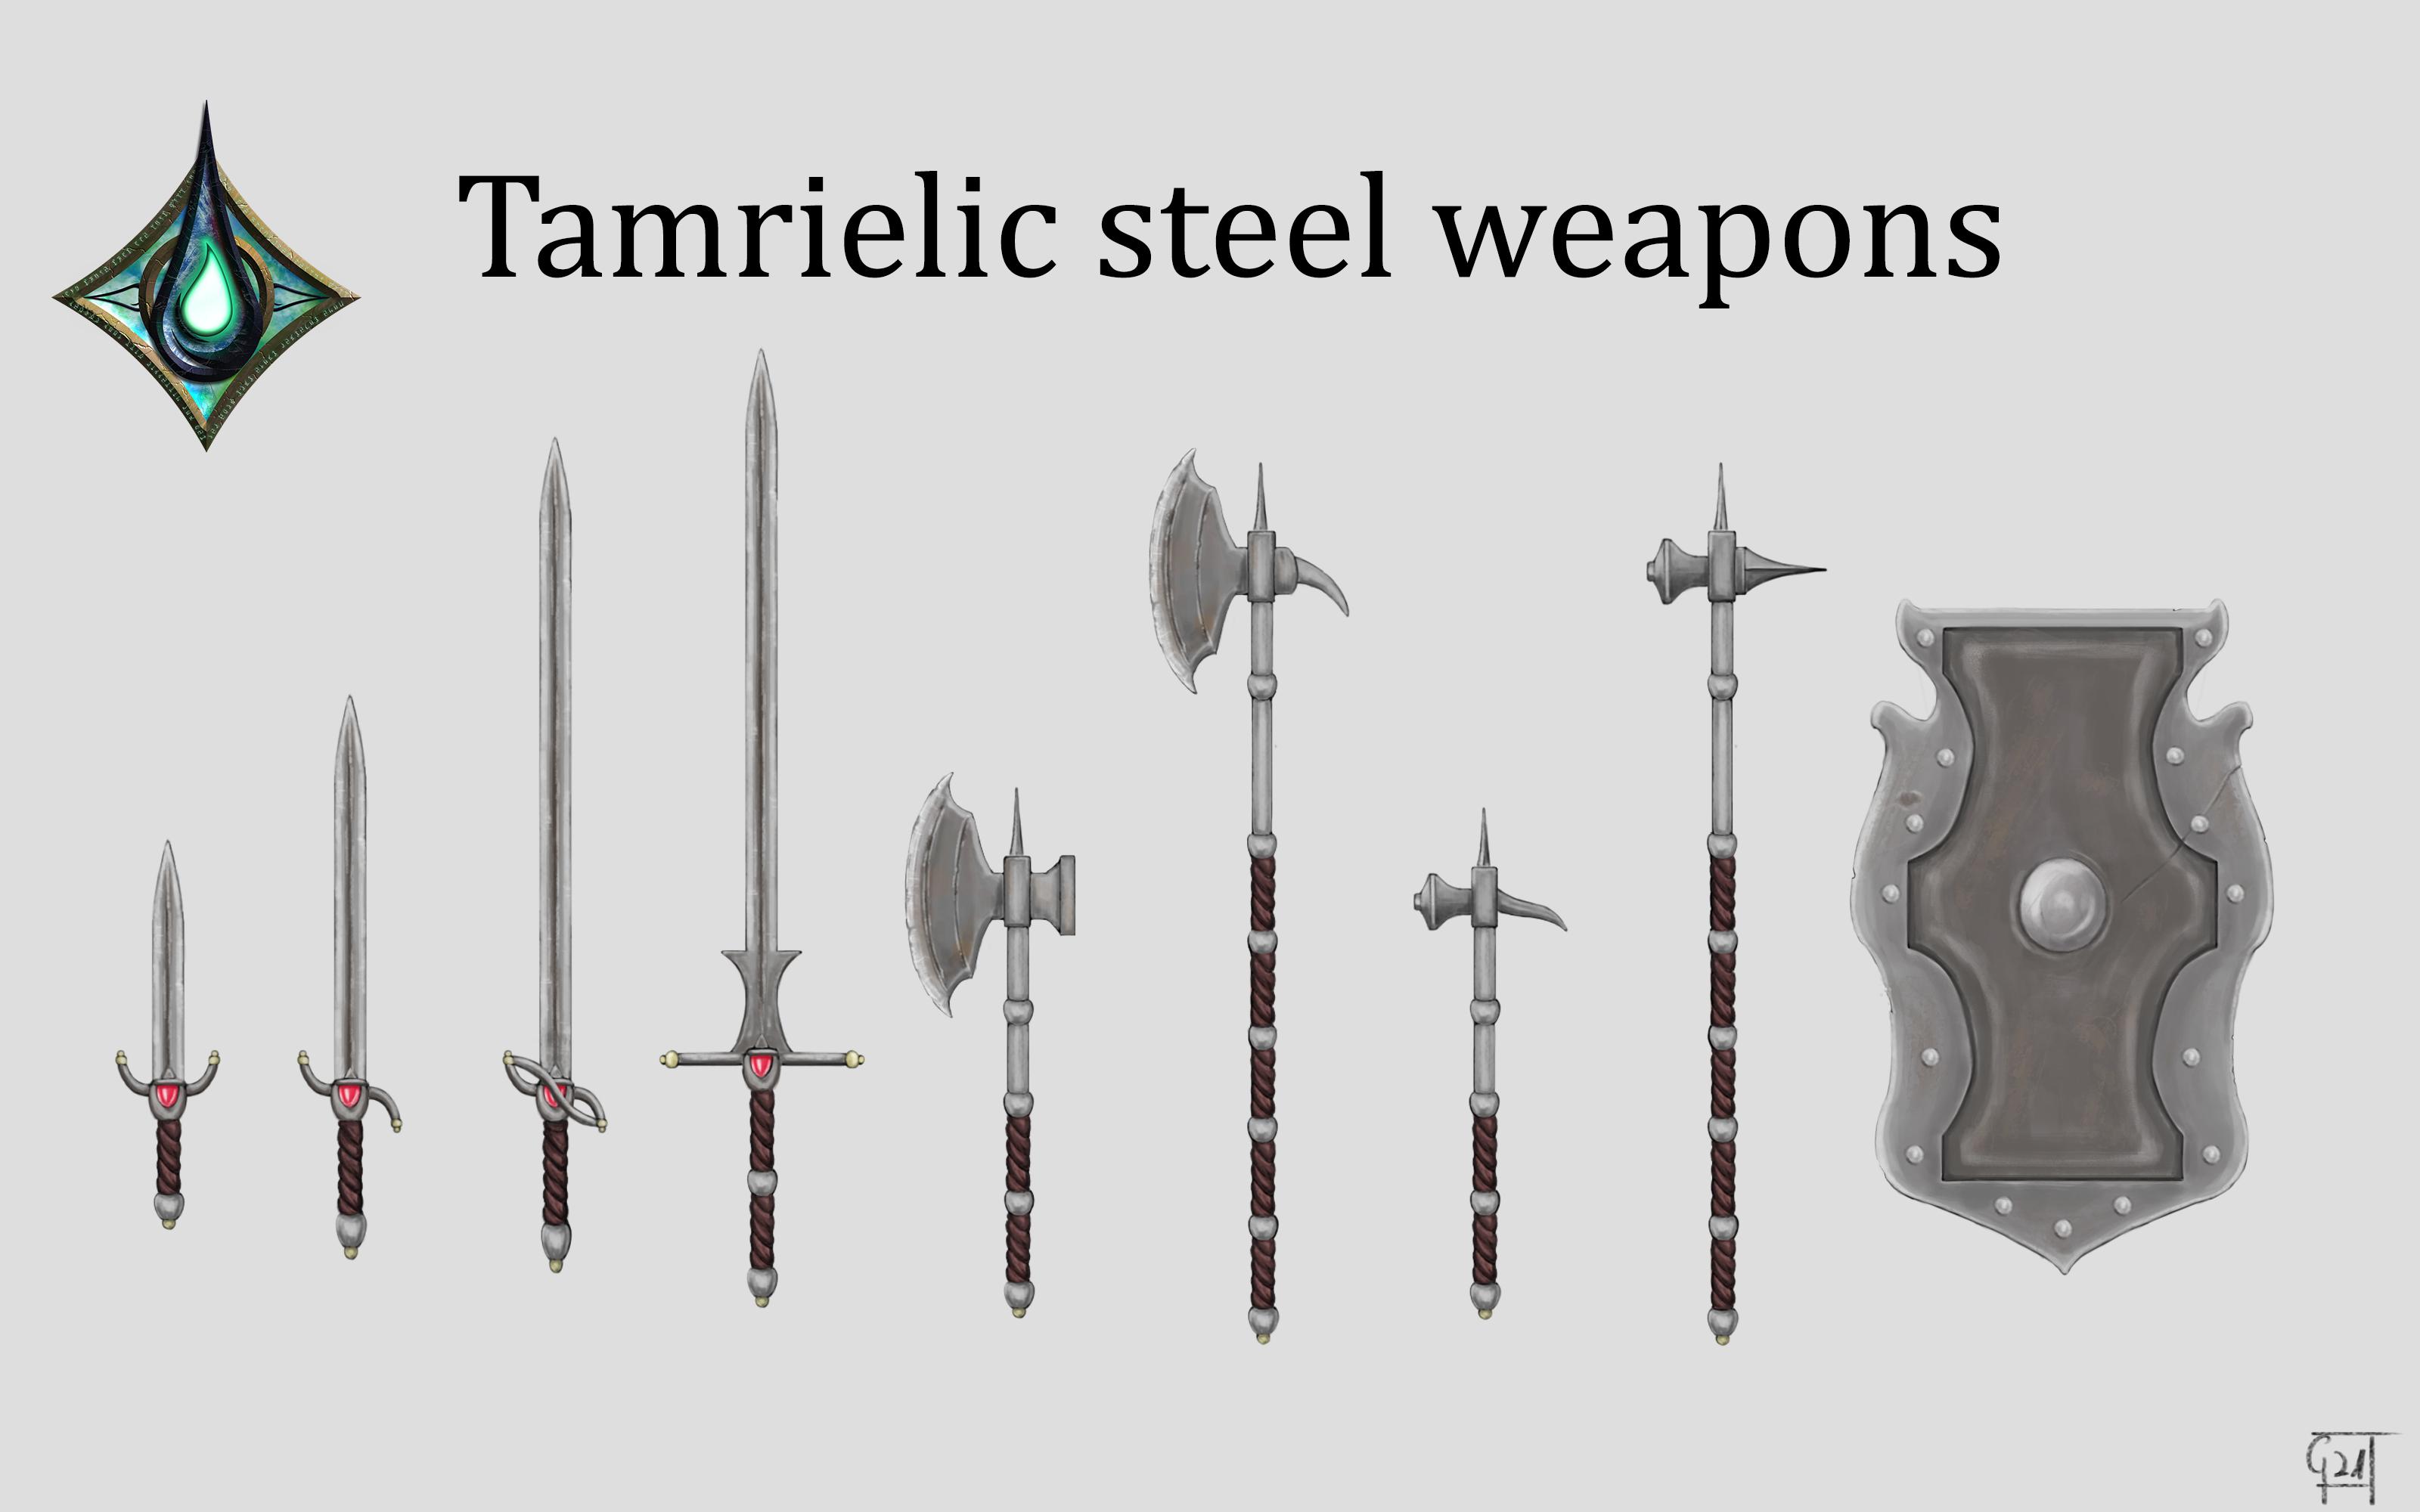 tamrielic steel weapons